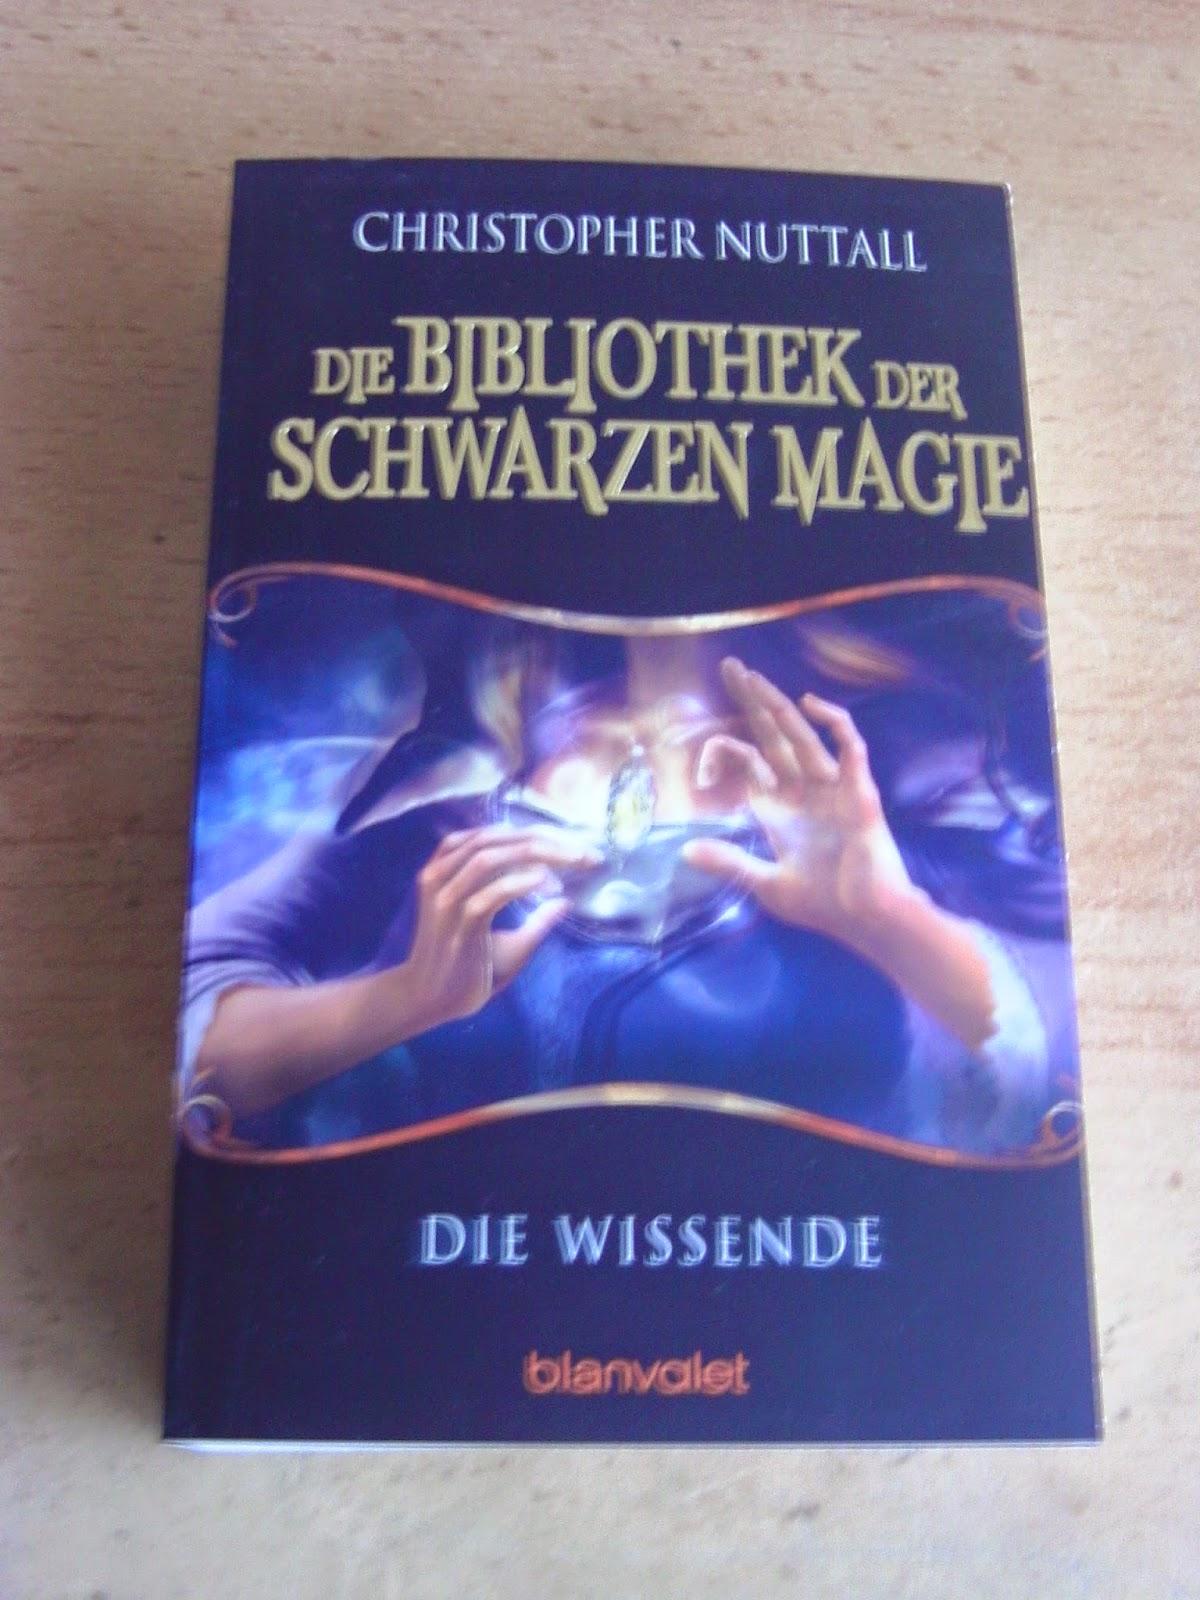 http://www.amazon.de/Die-Bibliothek-Schwarzen-Magie-Wissende/dp/3442264057/ref=sr_1_1?s=books&ie=UTF8&qid=1424039641&sr=1-1&keywords=die+bibliothek+der+schwarzen+magie